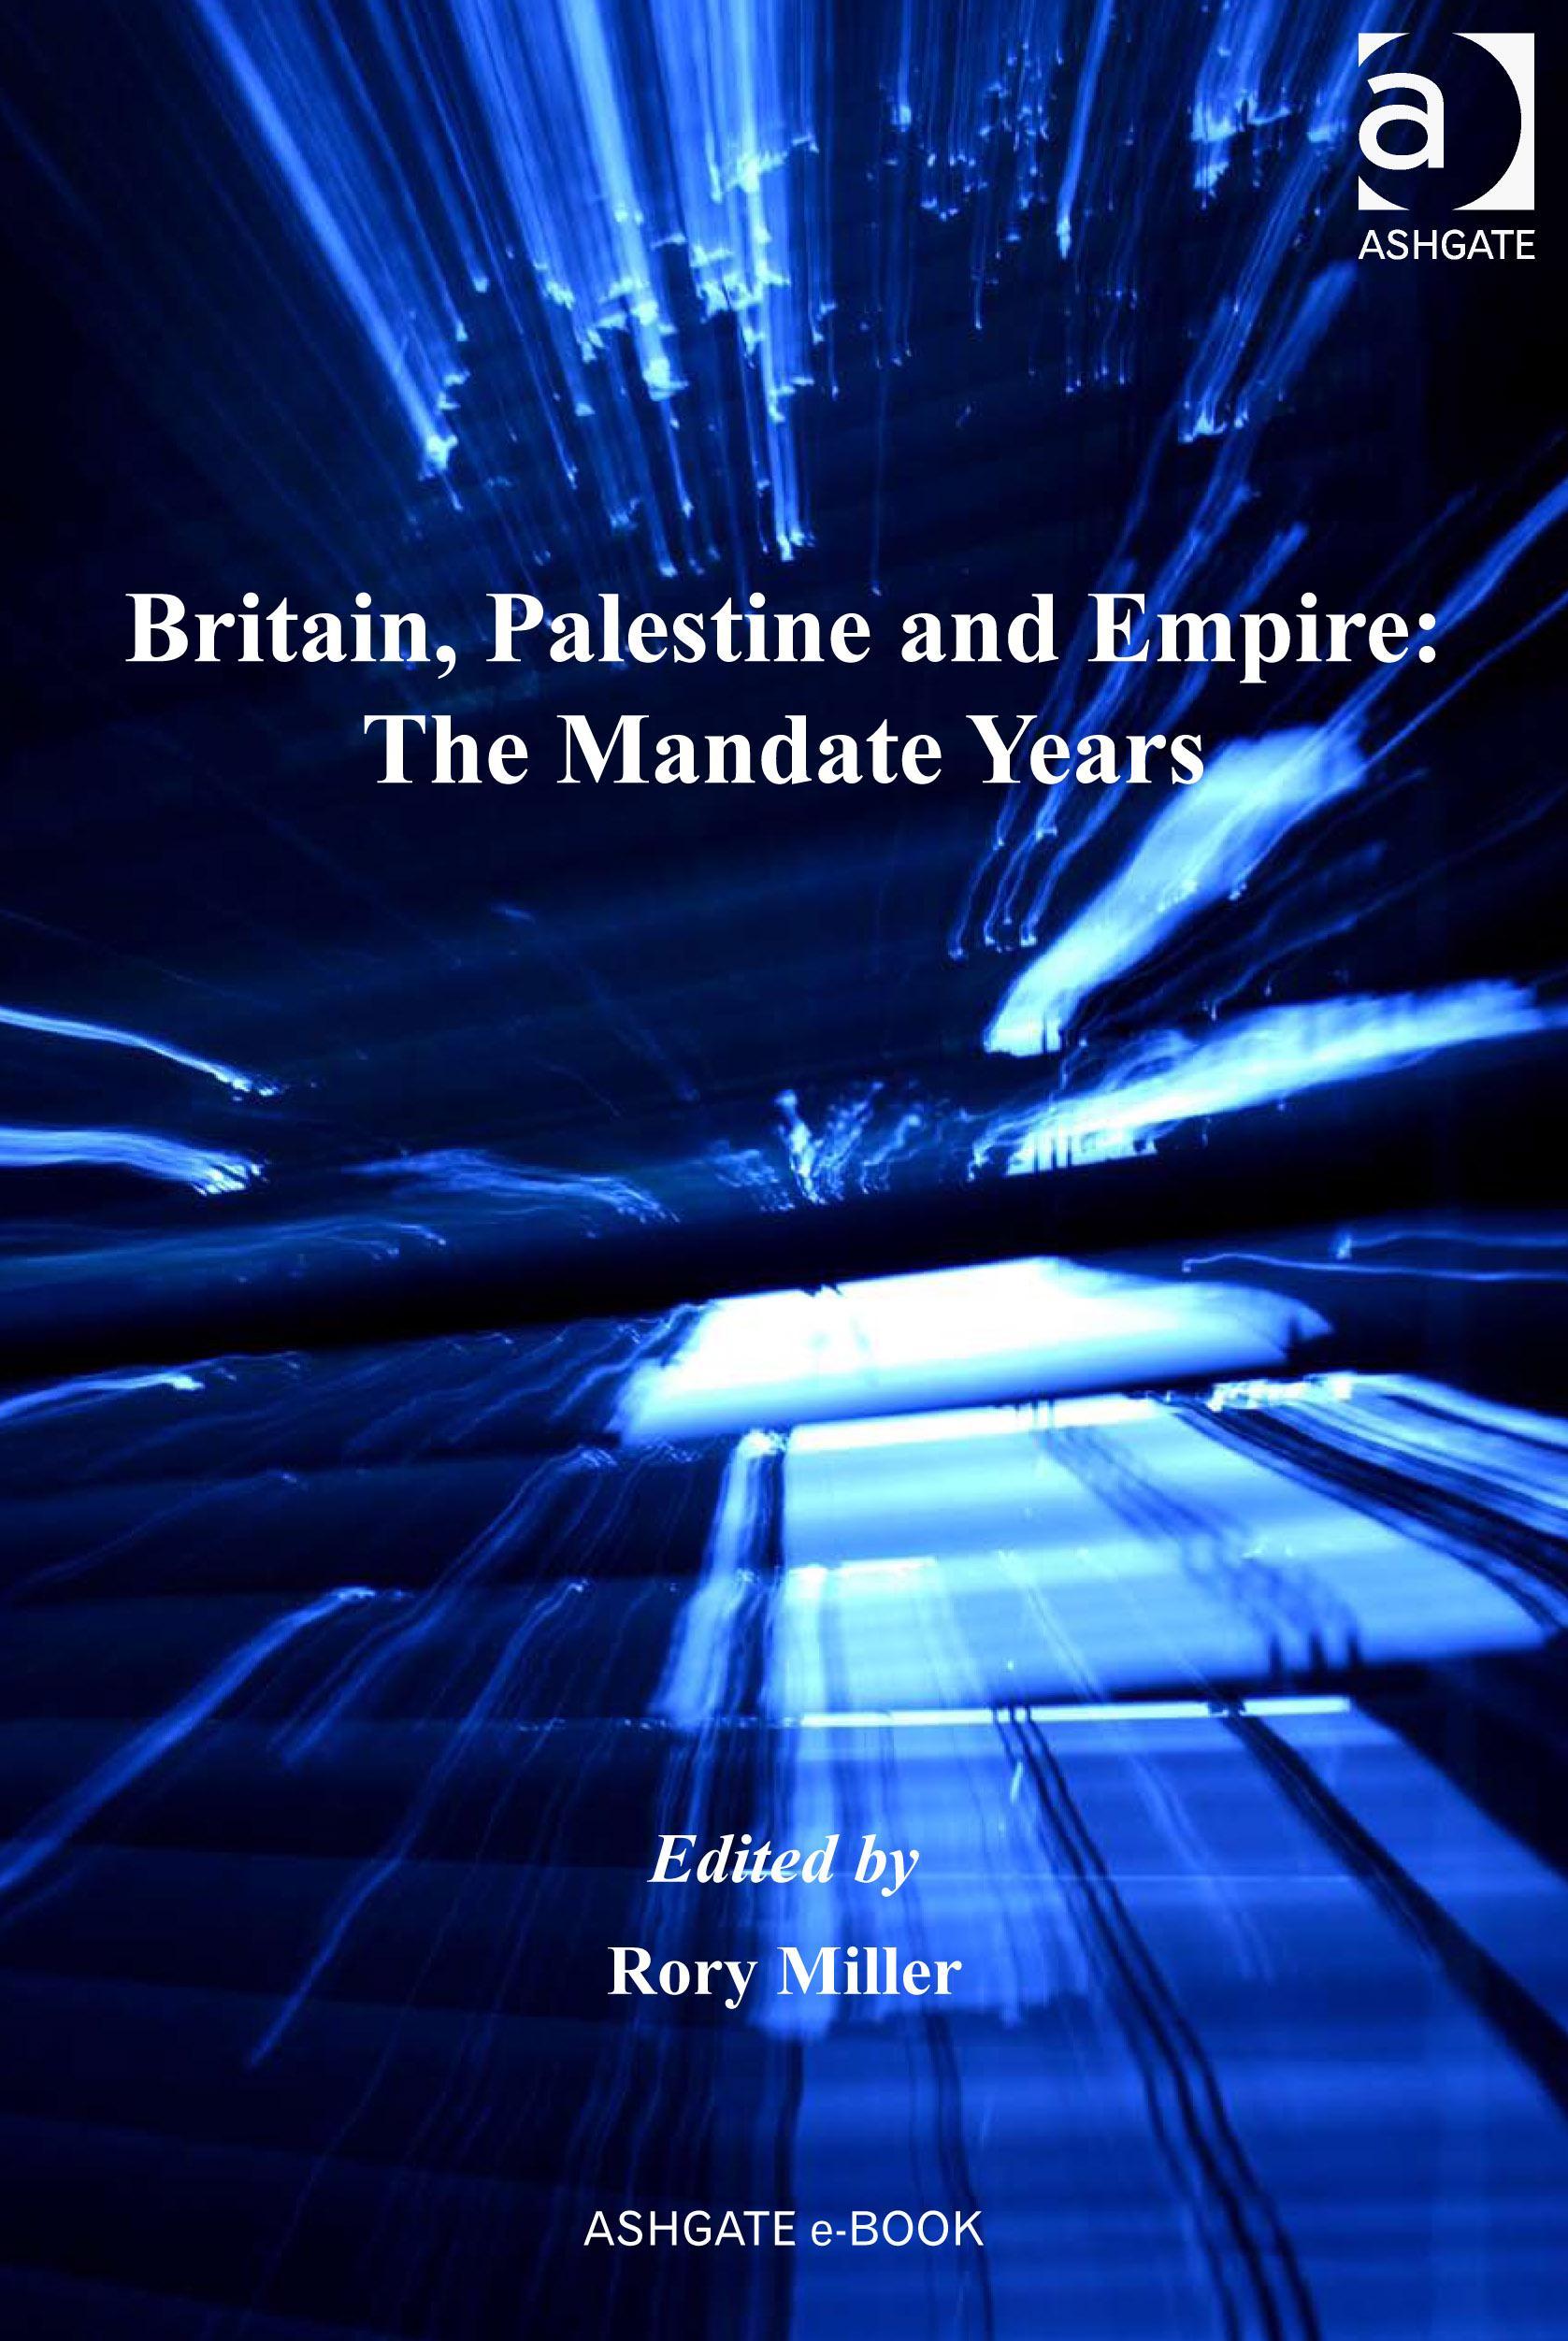 Britain, Palestine and Empire: The Mandate Years EB9781409424598